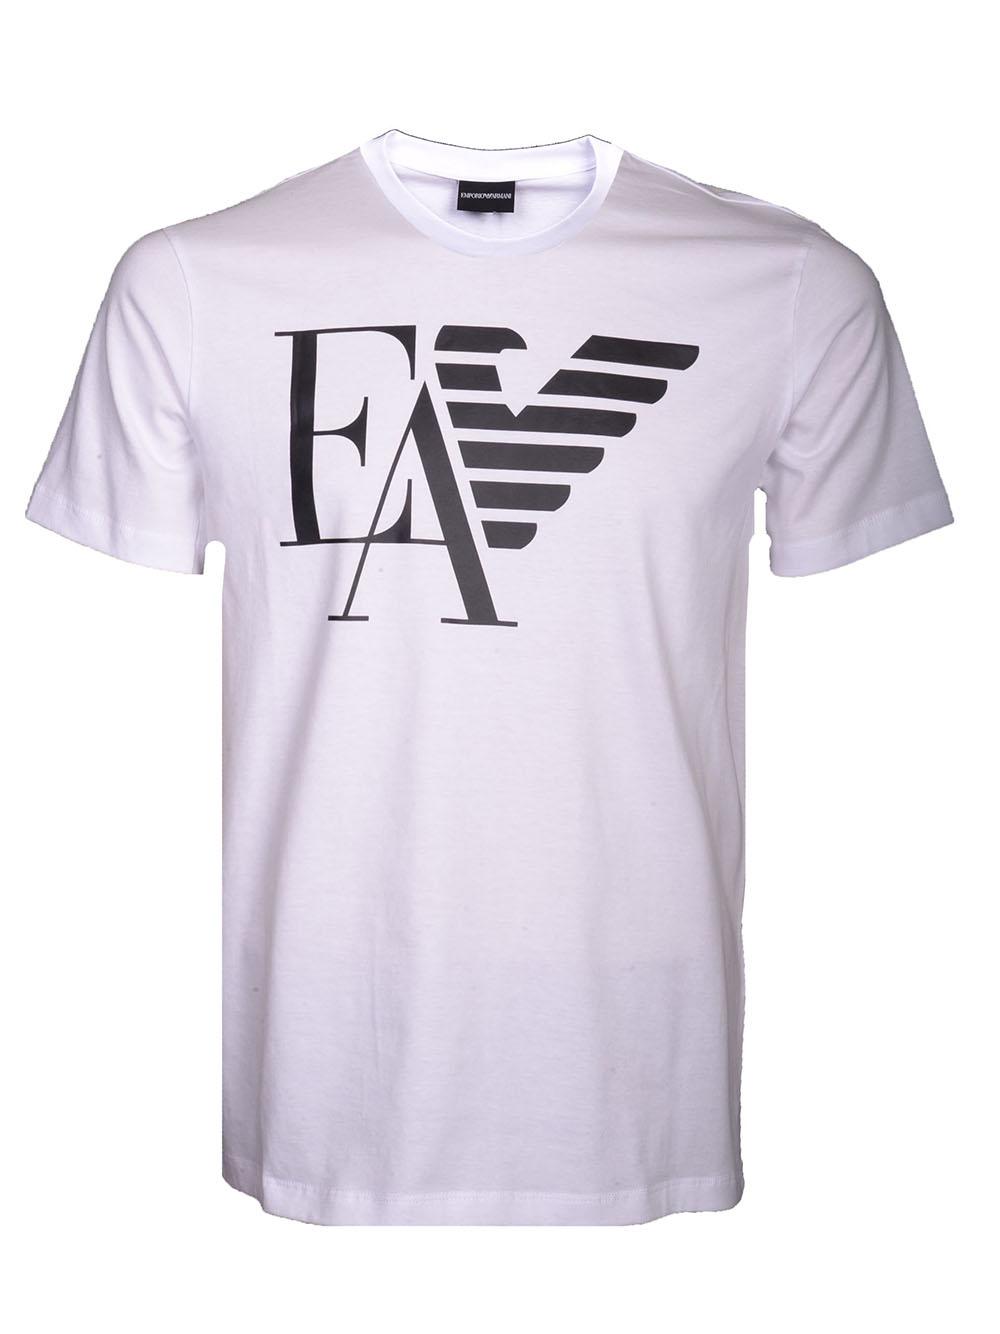 ac1f9a967622 EMPORIO ARMANI Μπλούζα T-Shirt 3G1TA9 1J00Z ΛΕΥΚΟ